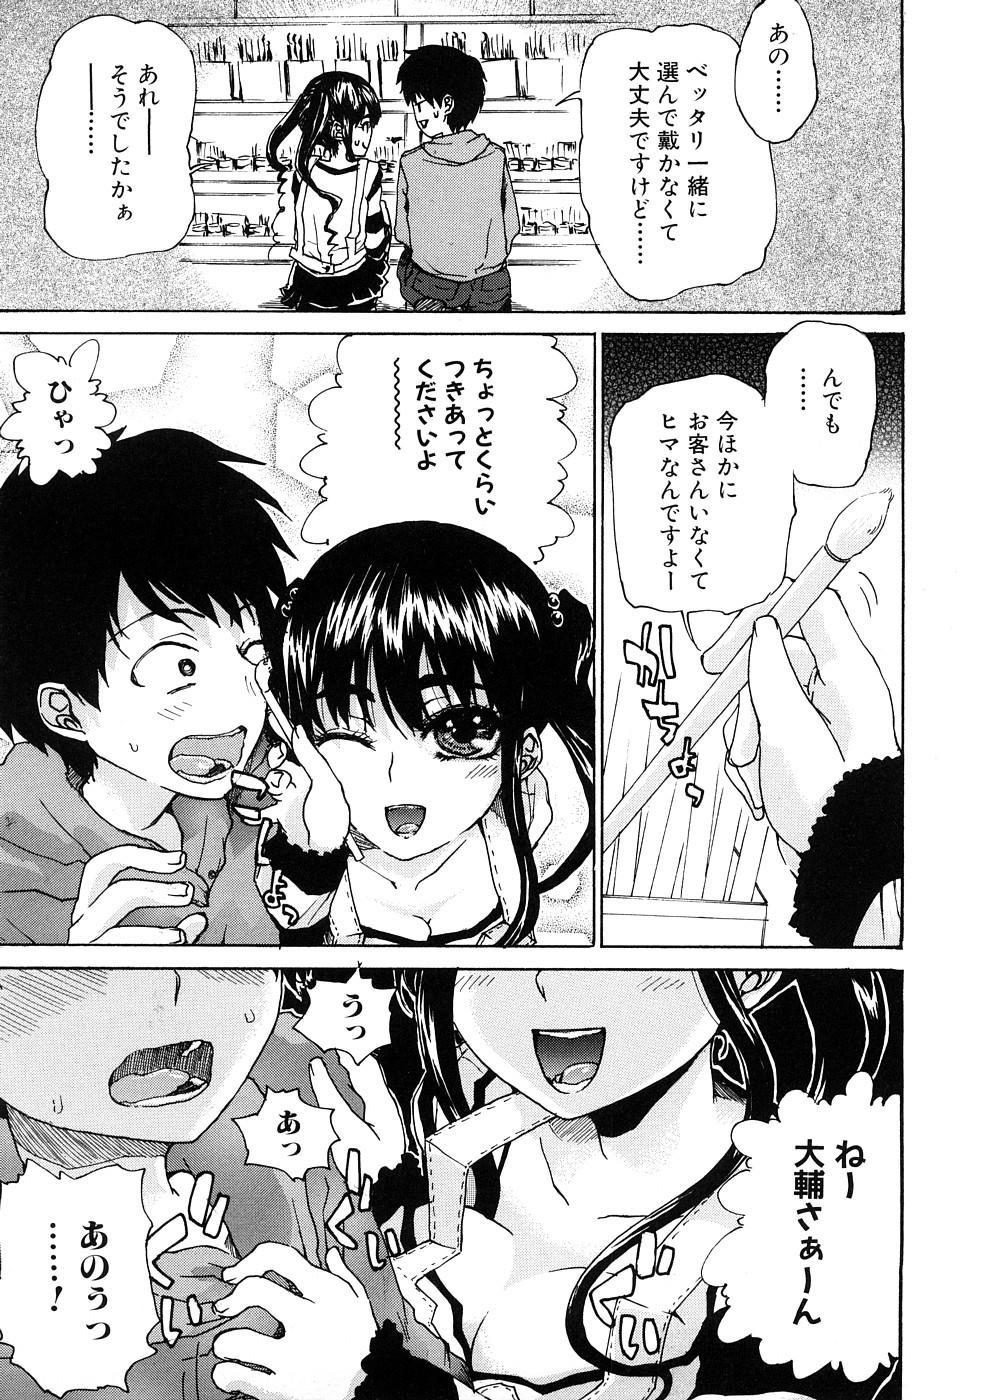 Ecchi de Jibunkatte de Kawaii Ko 84